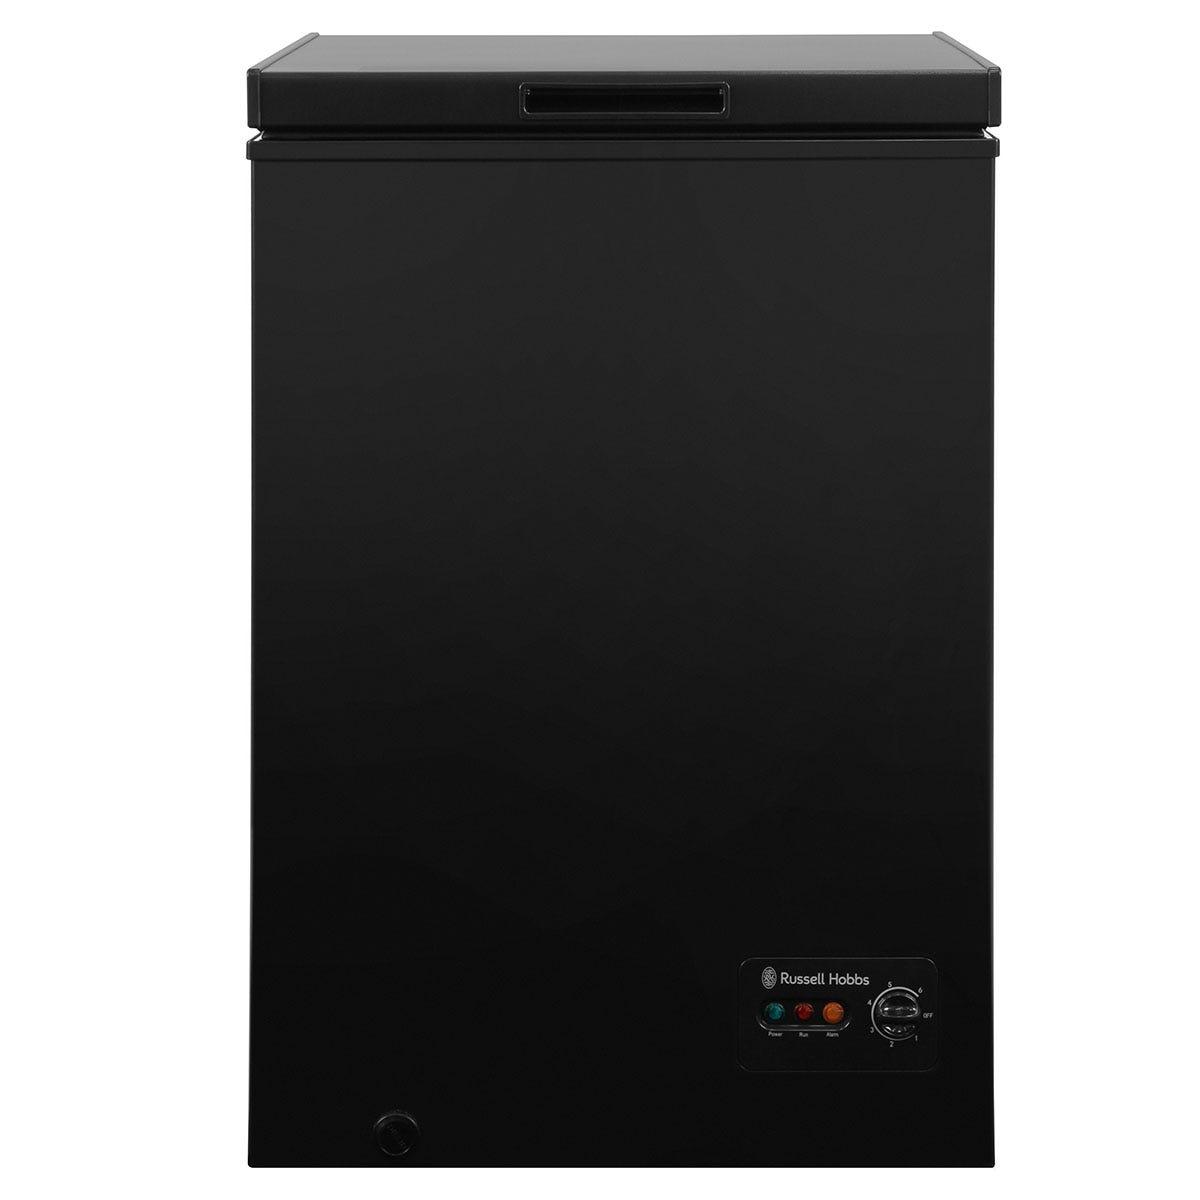 Russell Hobbs RHCF99B 99L Chest Freezer - Black